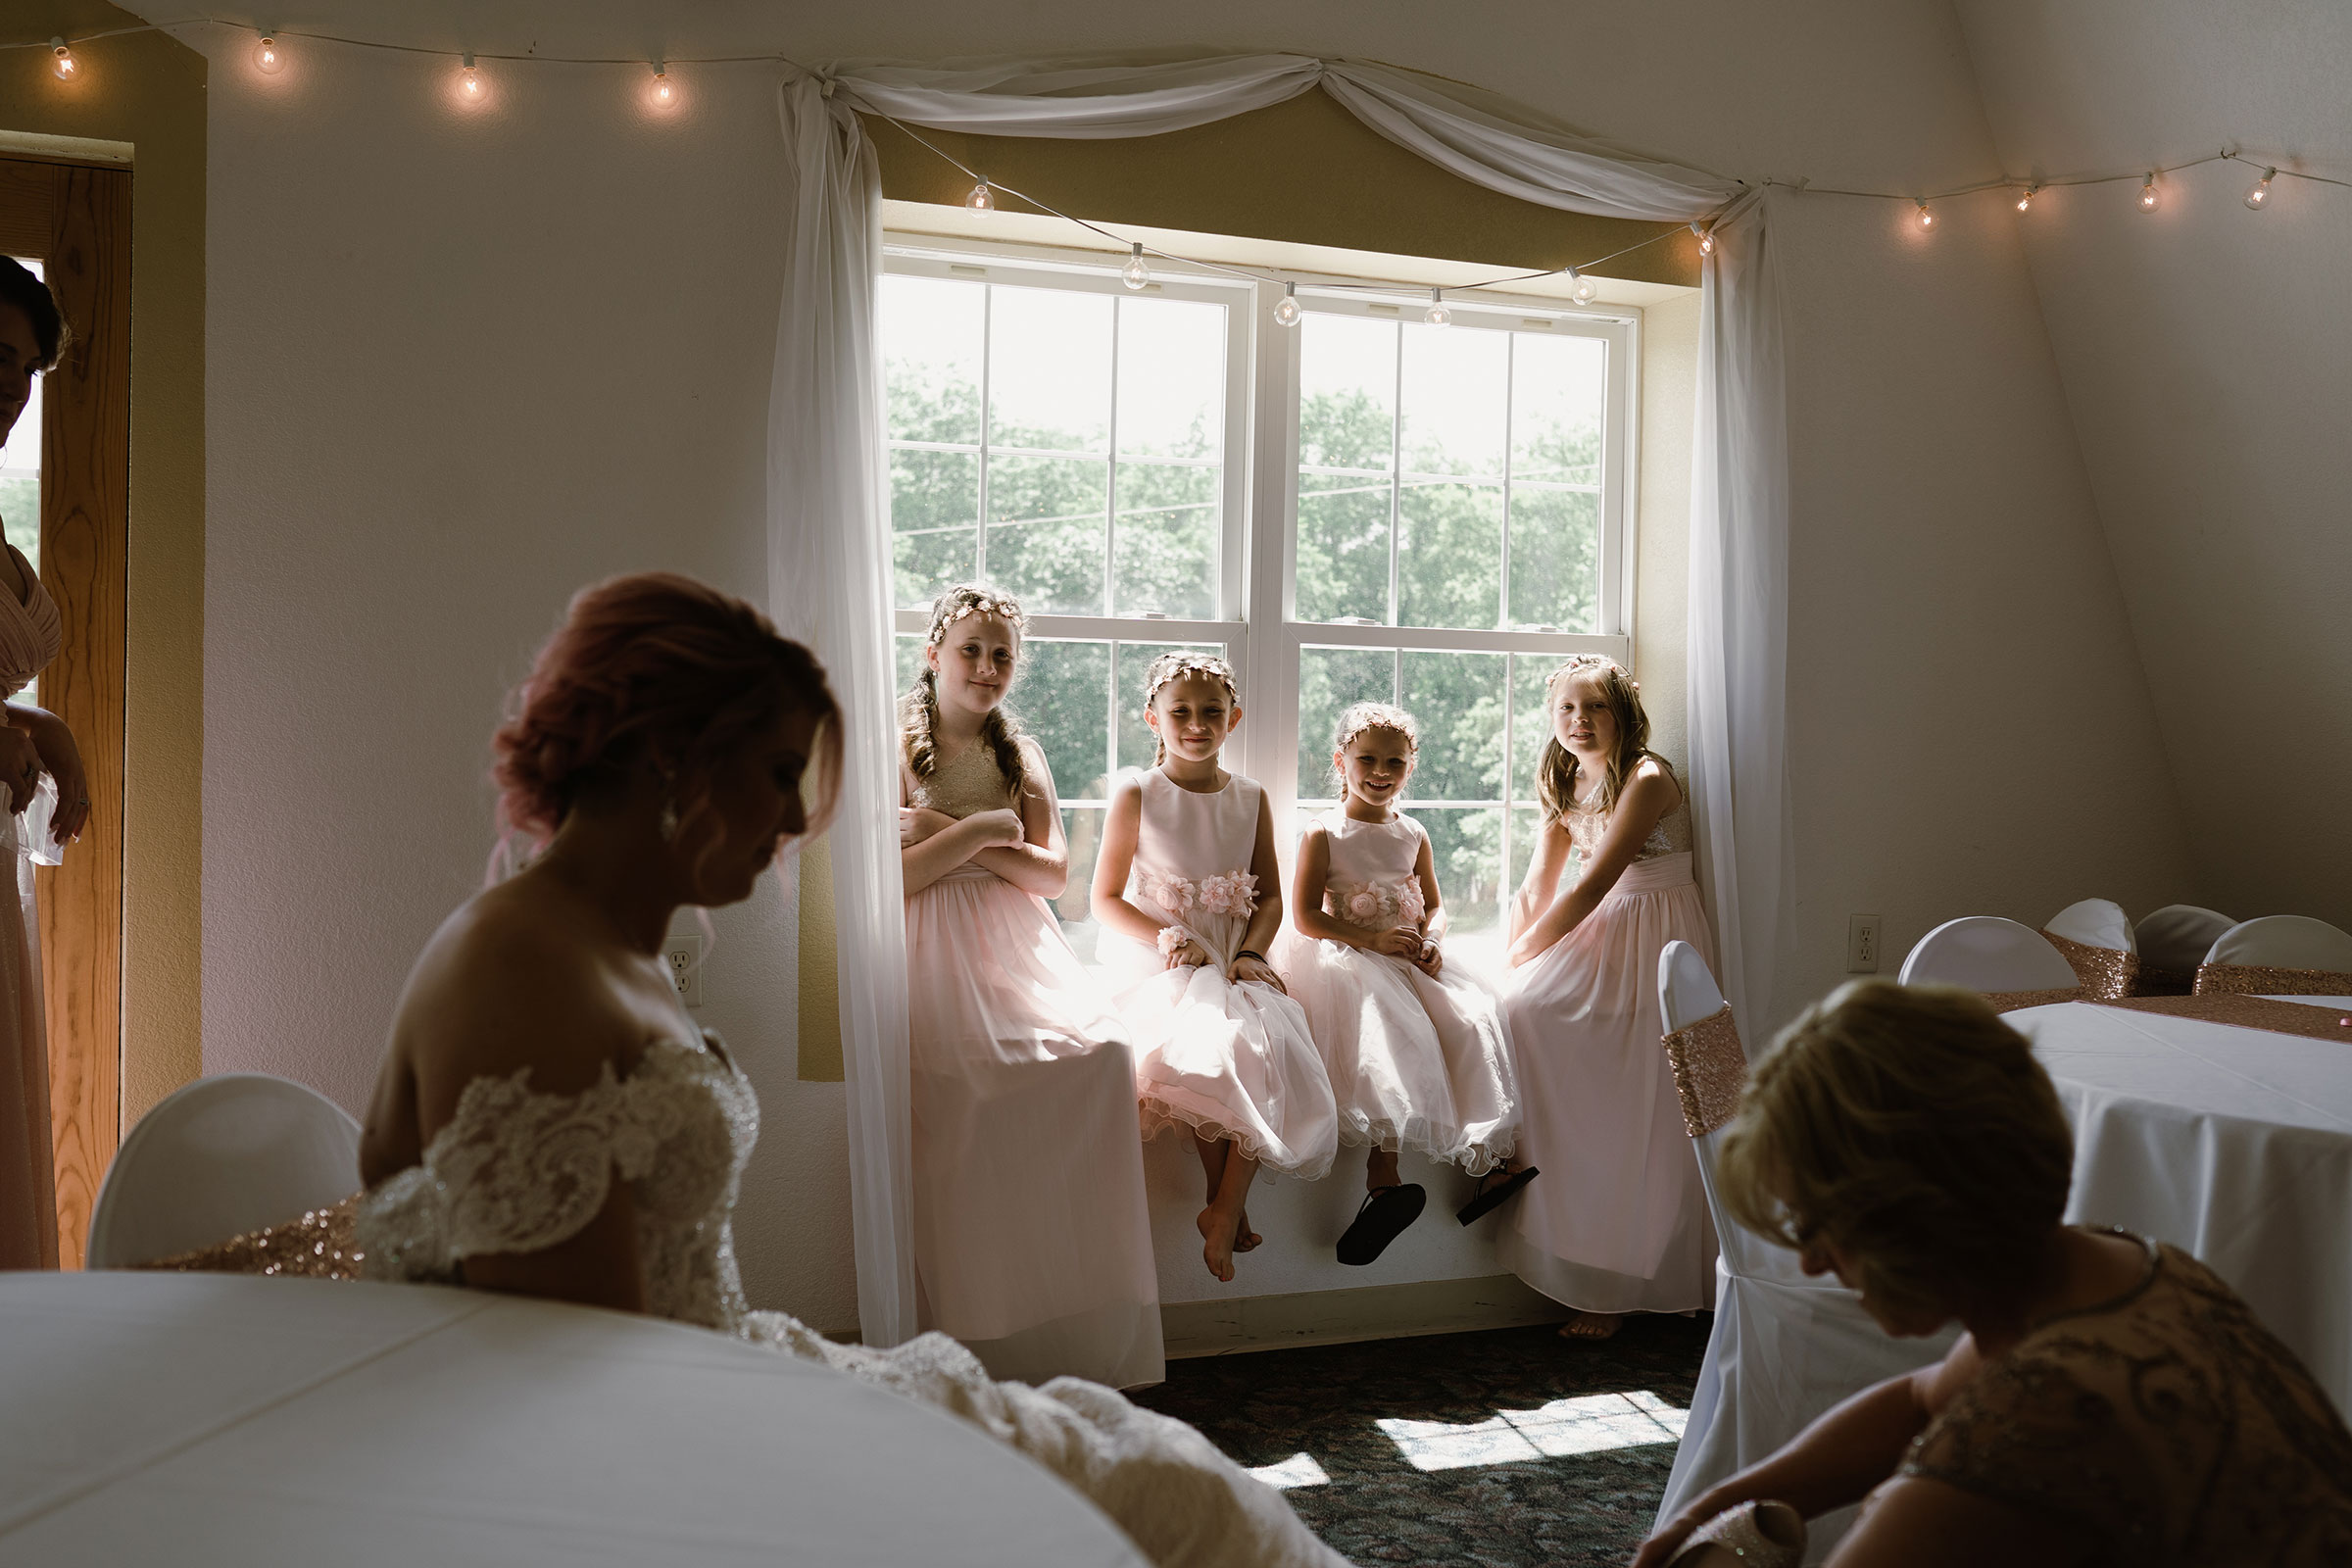 flower-girls-watching-bride-get-ready-wedding-summerset-winery-indianola-iowa-raelyn-ramey-photography.jpg